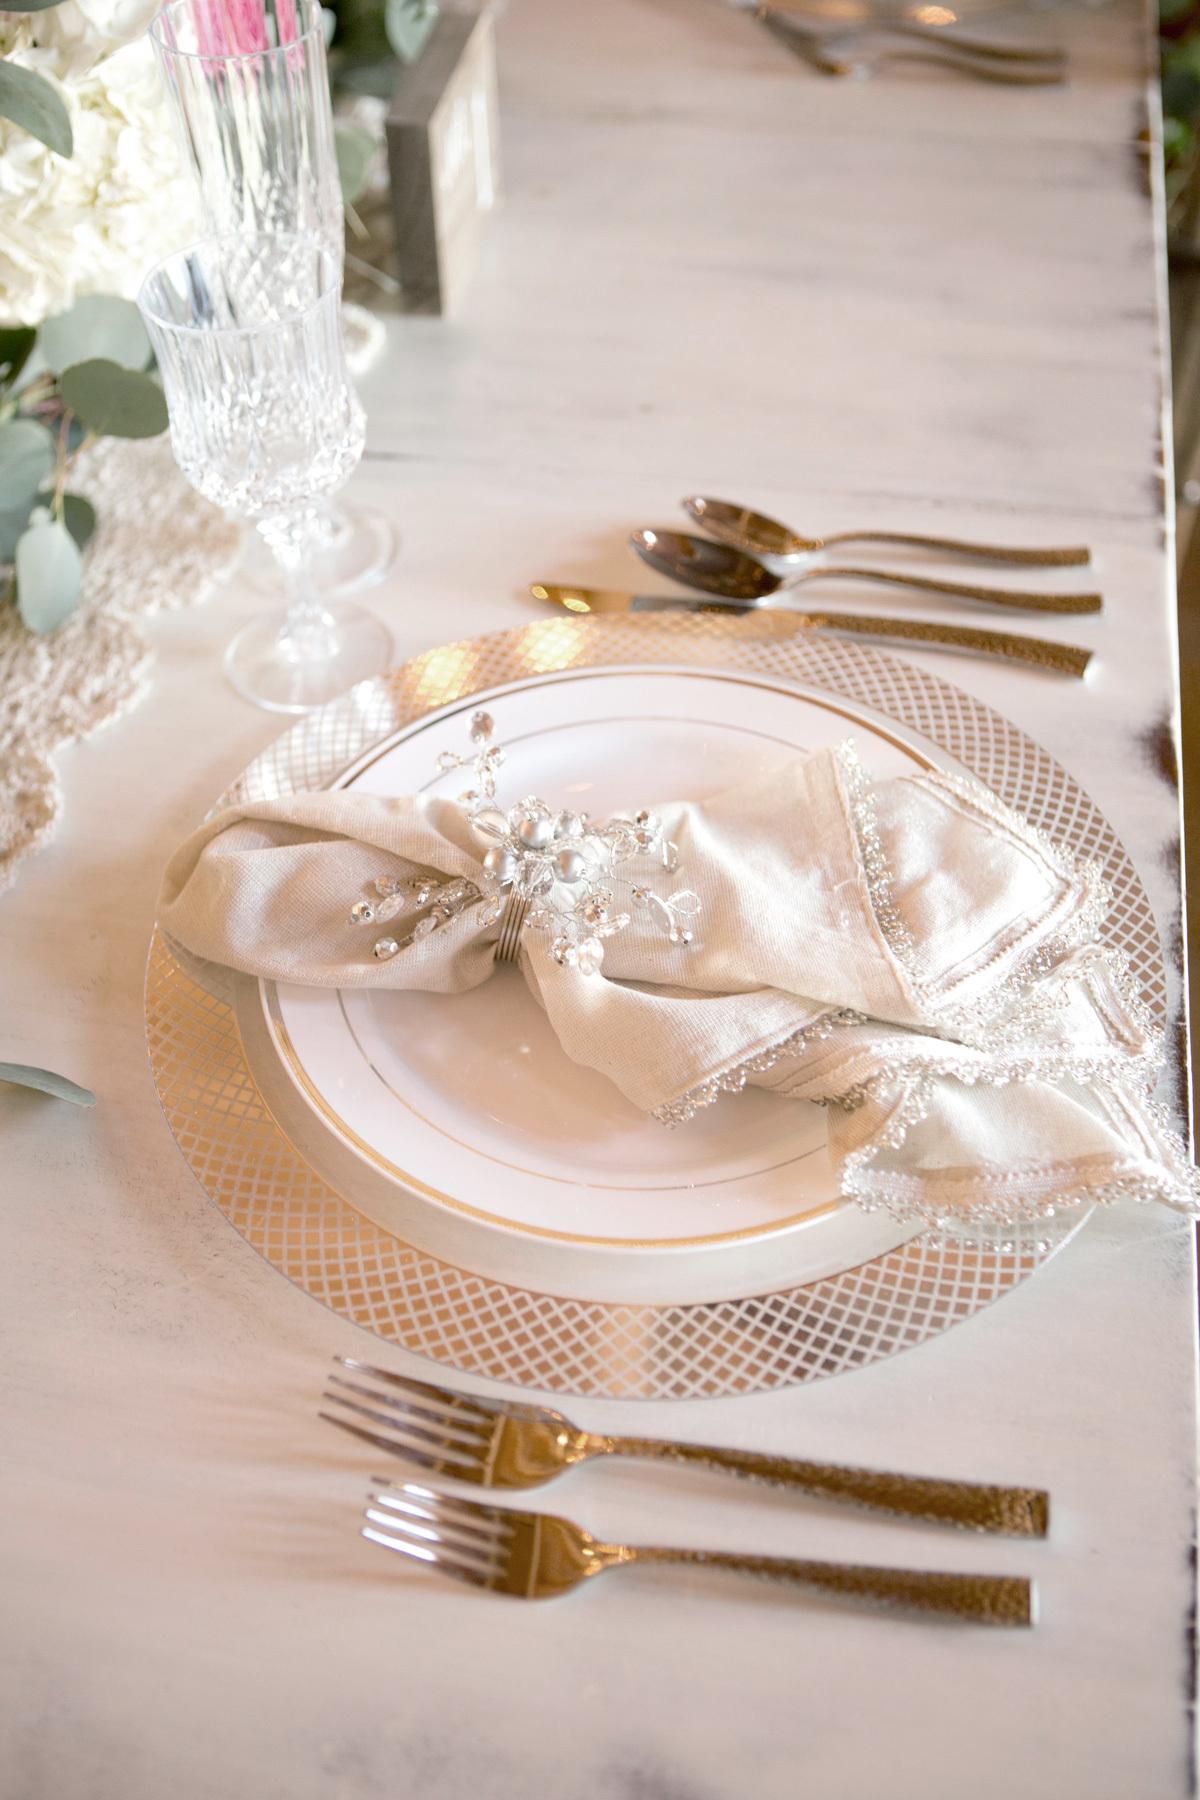 Bride And Groom Reception Table Bride And Groom Reception Table Wedding  Place Setting